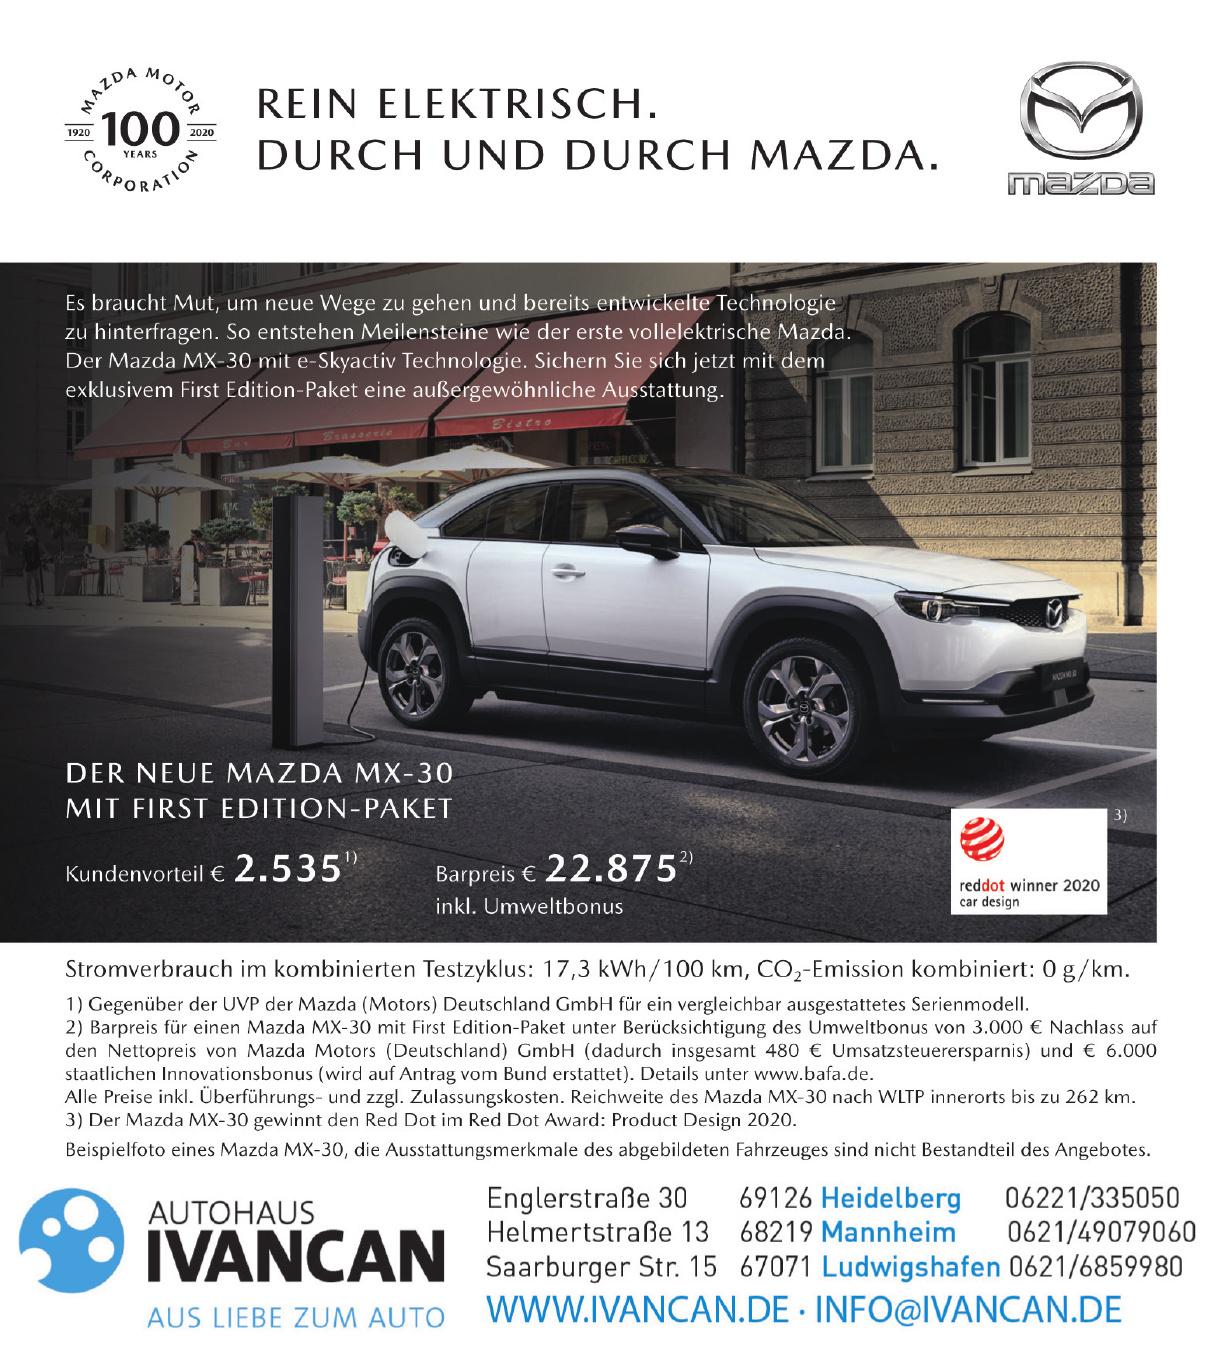 Autohaus Ivancan